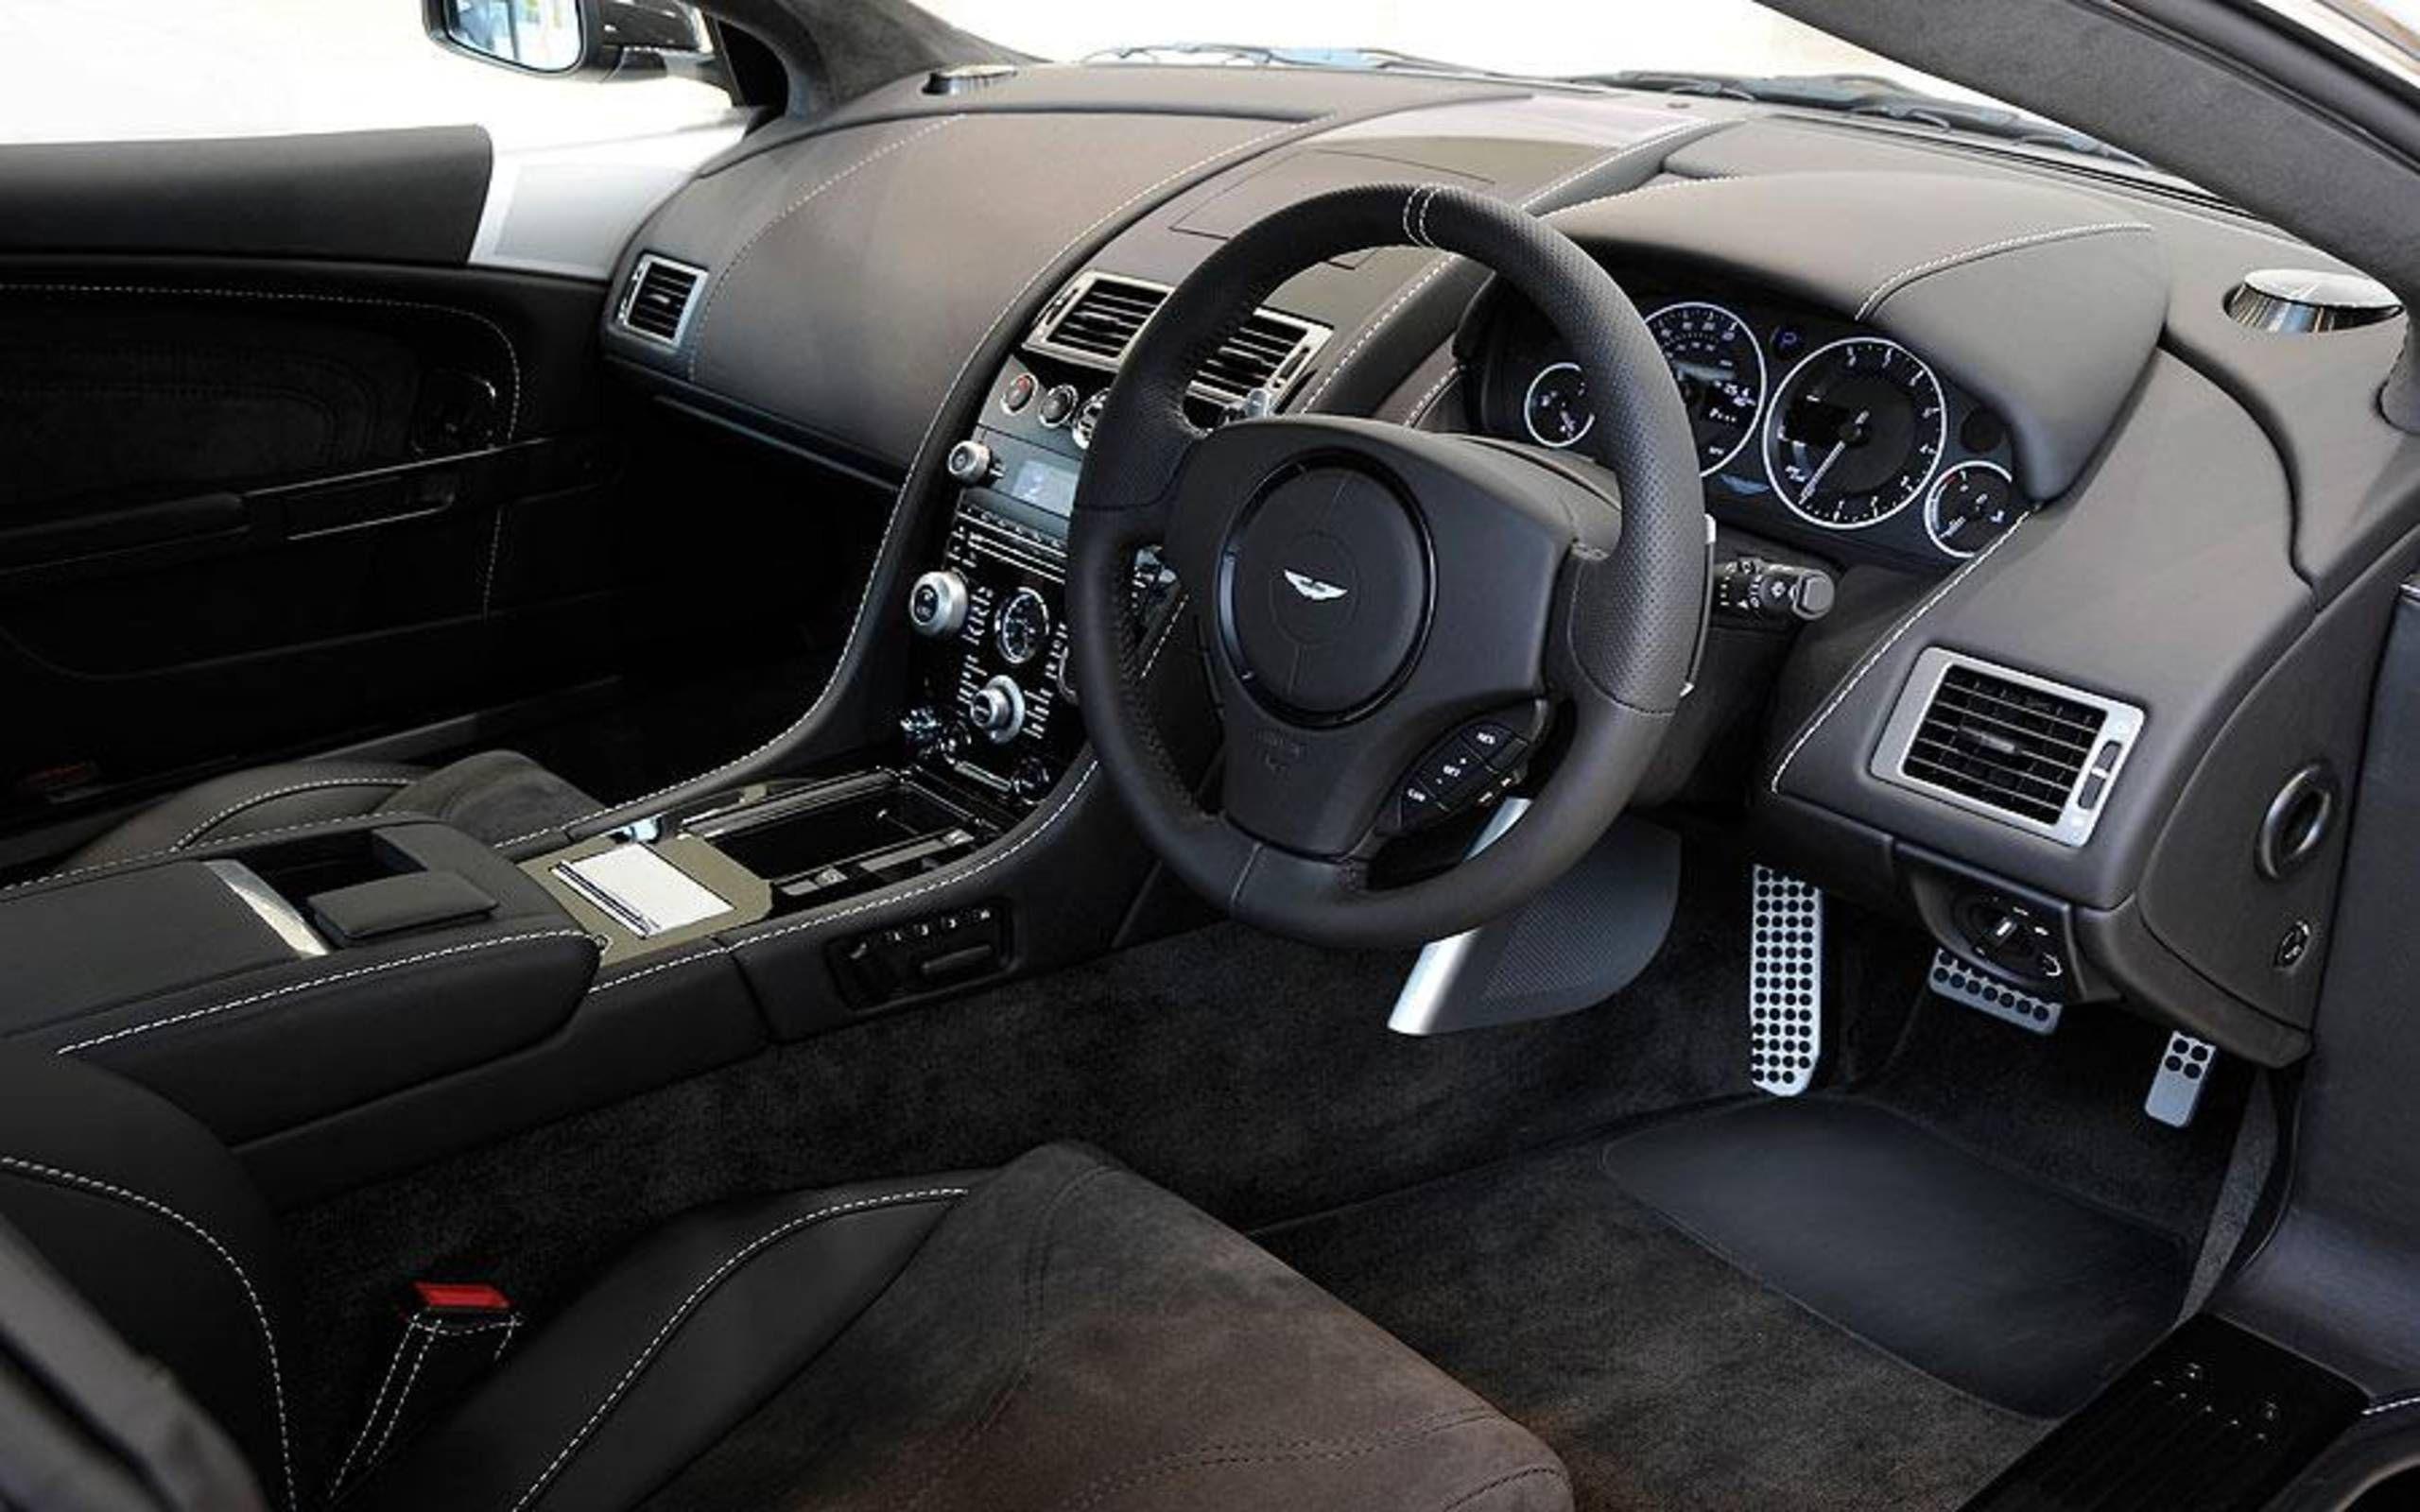 Aston Martin Dbs Touchtronic 2 A Bonding Experience